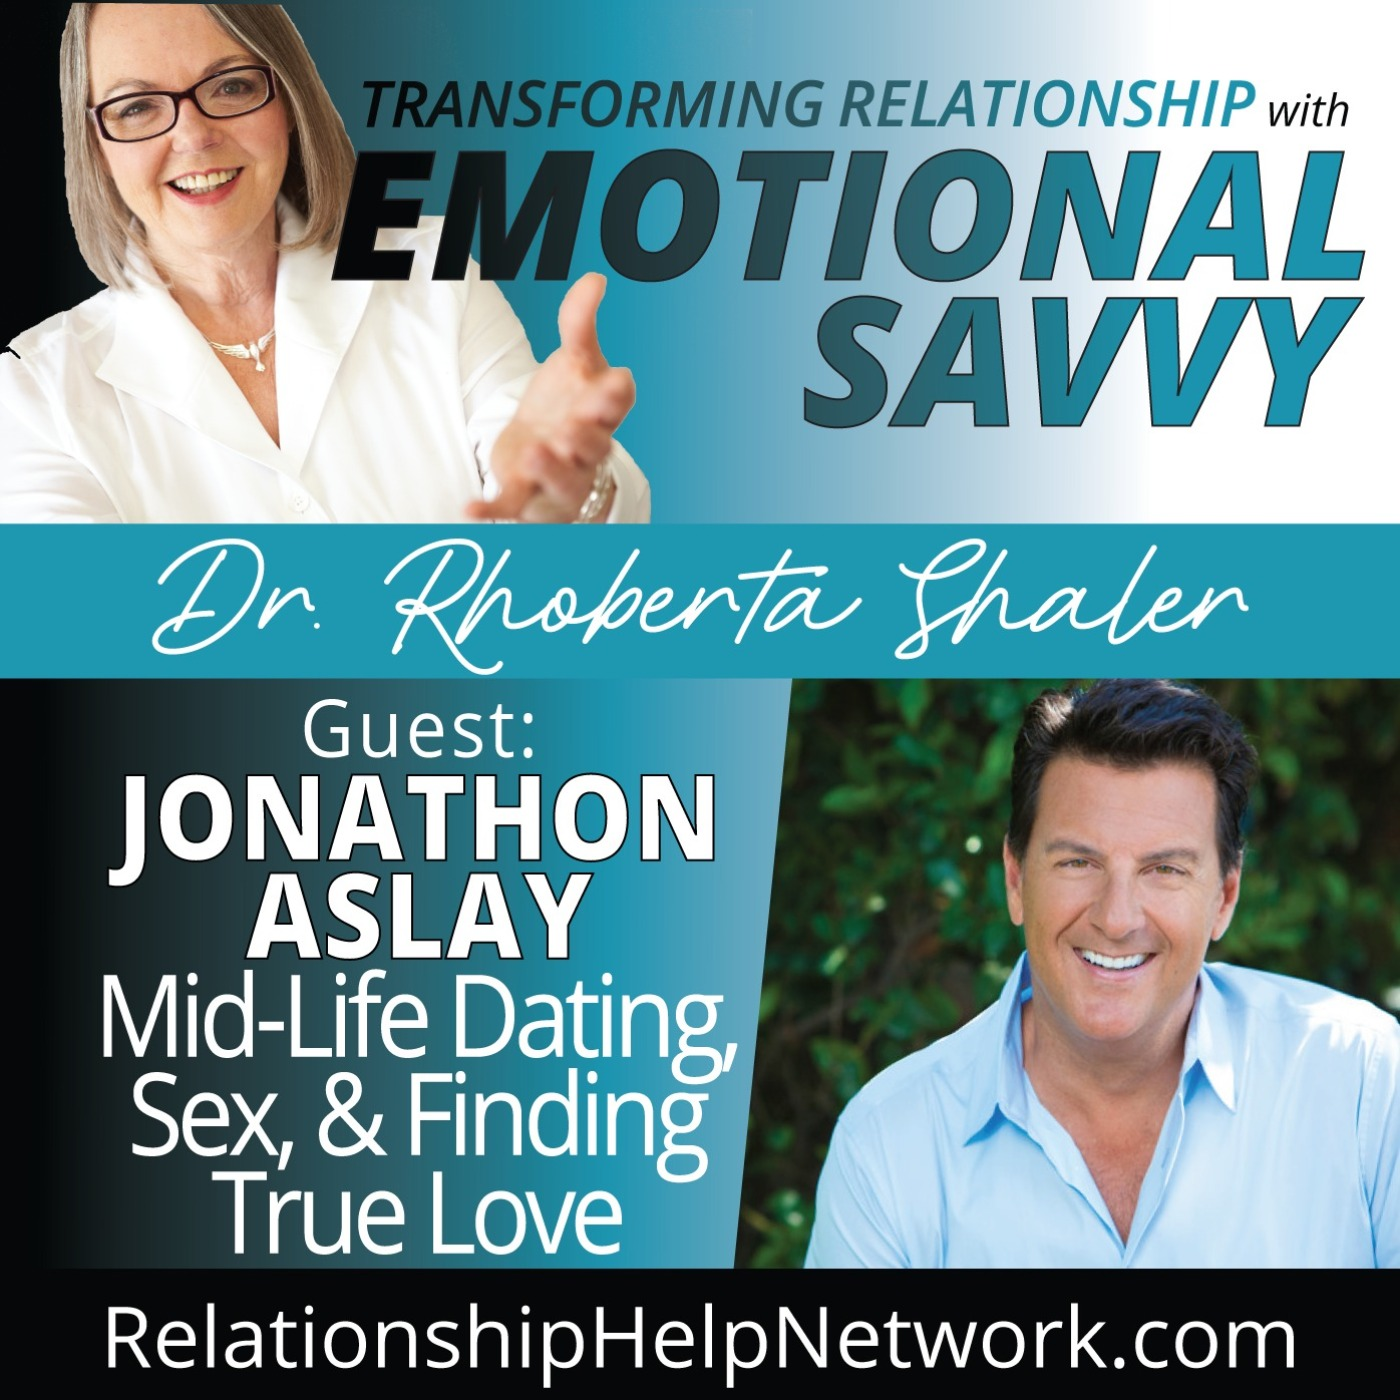 Mid-Life Dating, Sex & Finding True Love  GUEST: Jonathon Aslay